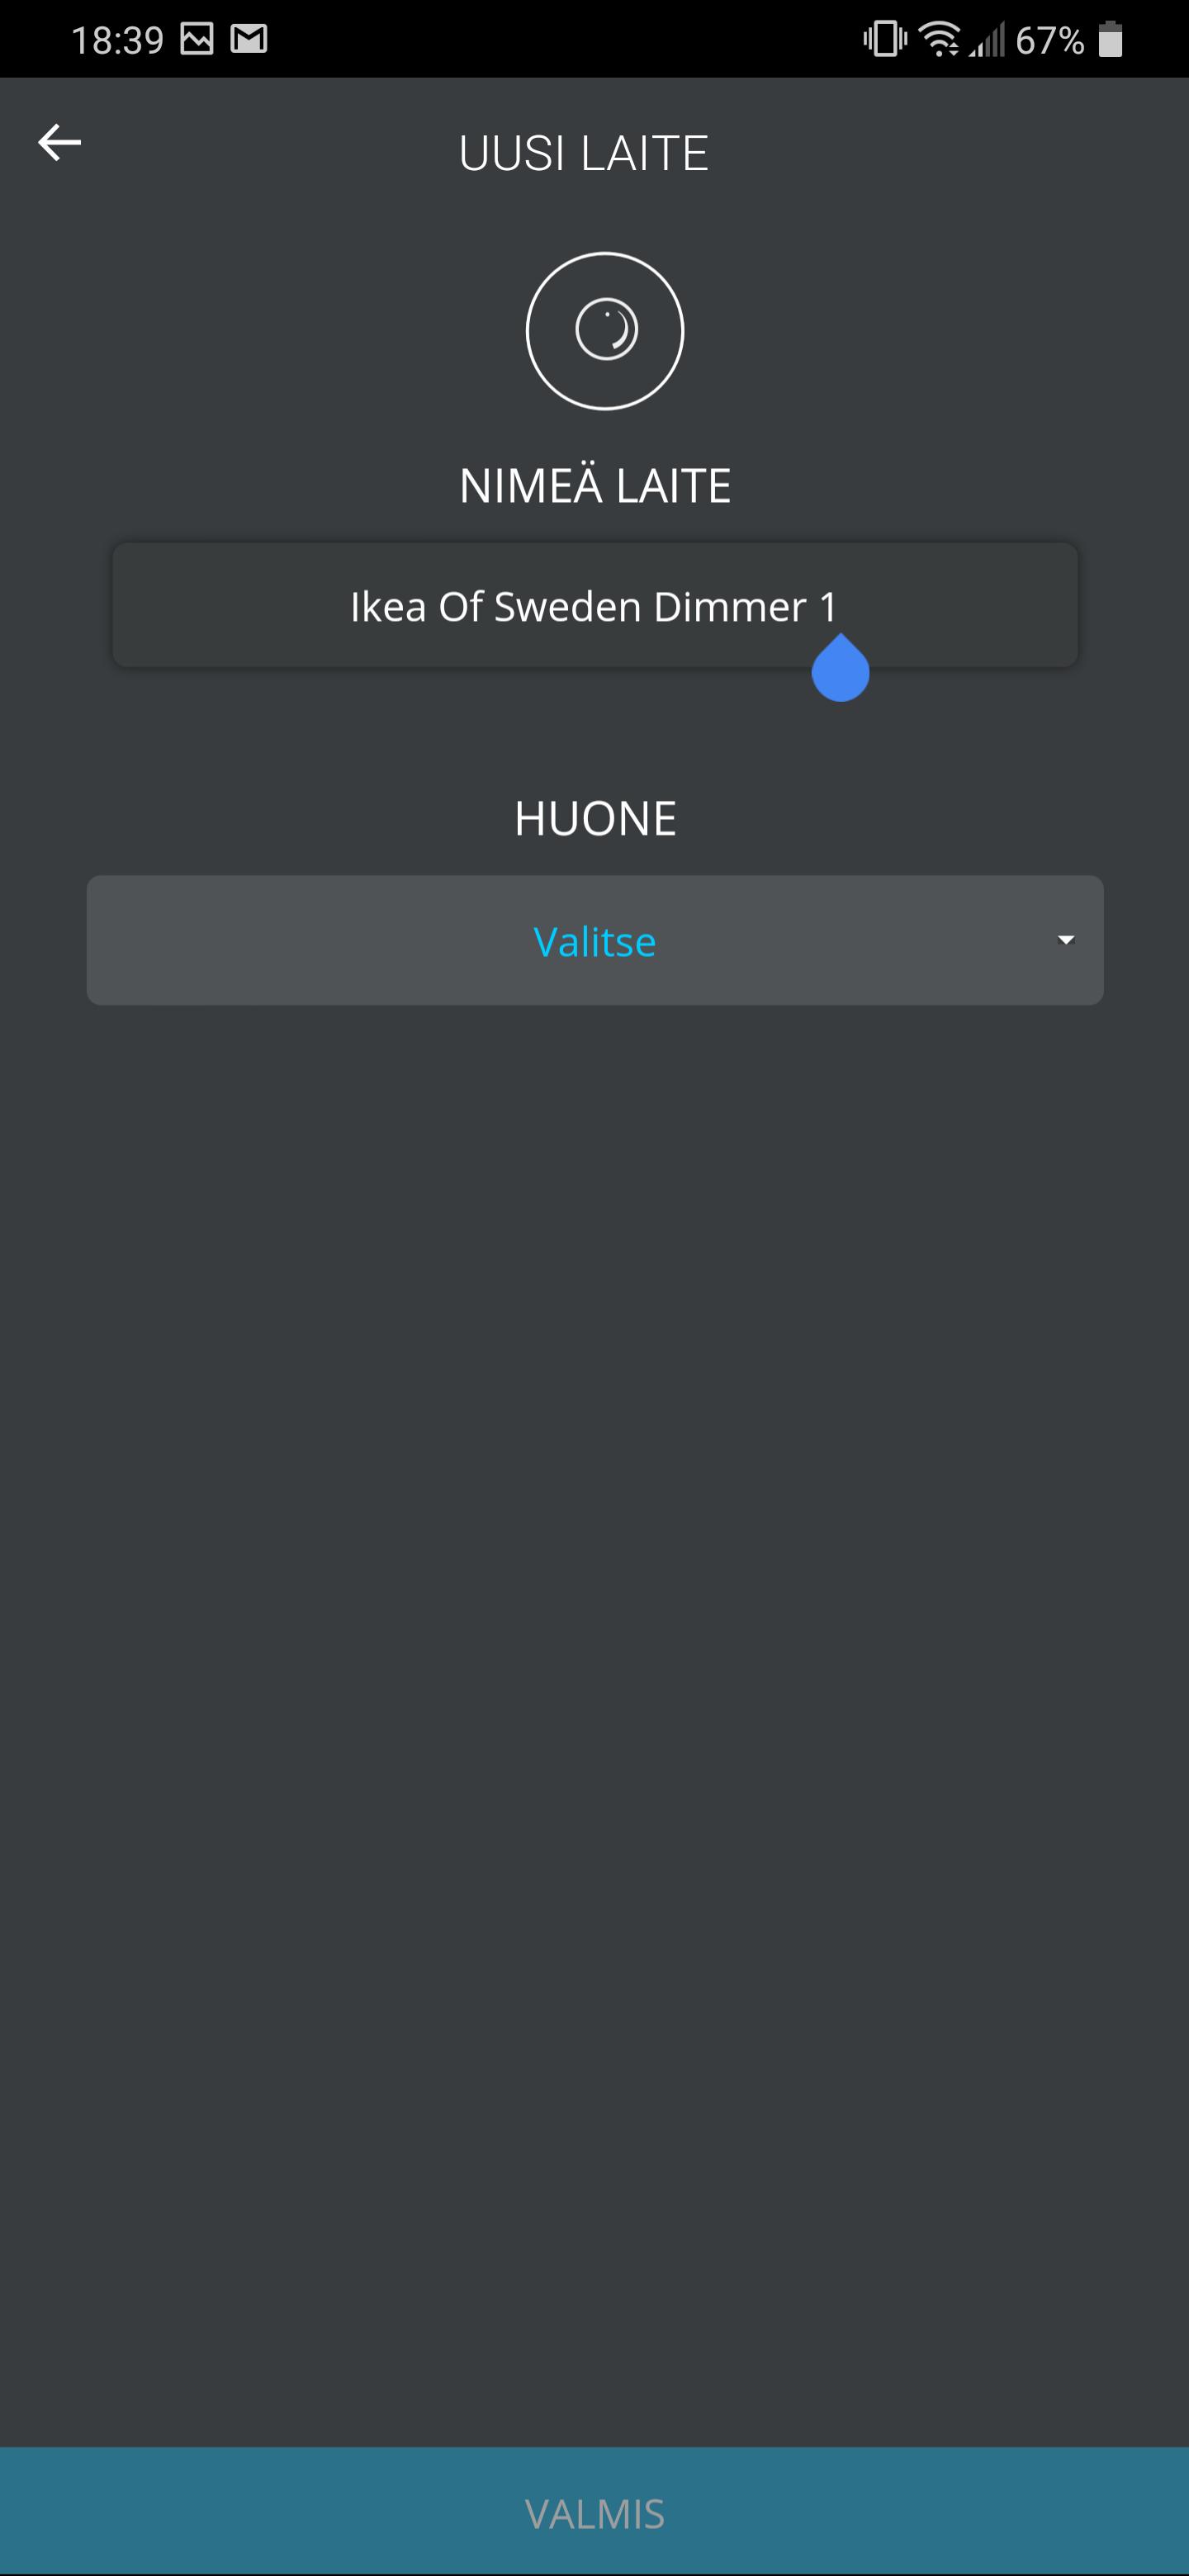 Screenshot_20191018-183908.png